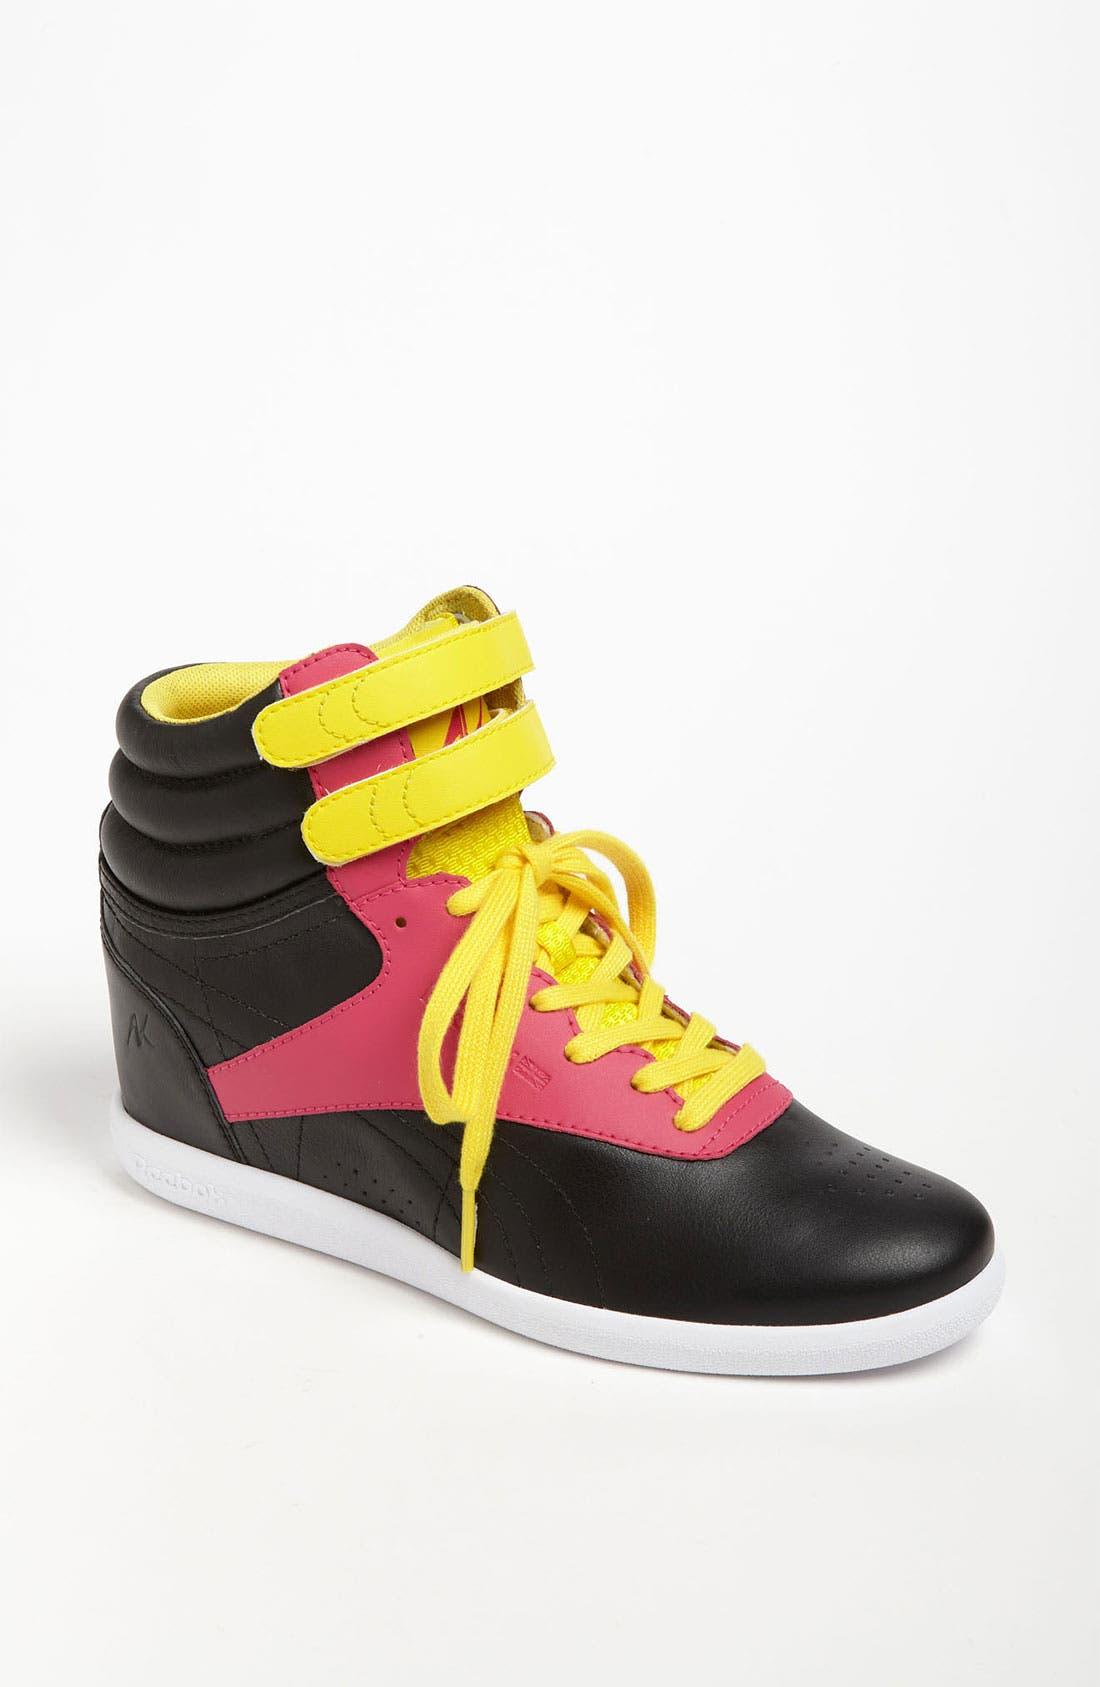 Alternate Image 1 Selected - Reebok 'Freestyle Hi Wedge A. Keys' Sneaker (Women)